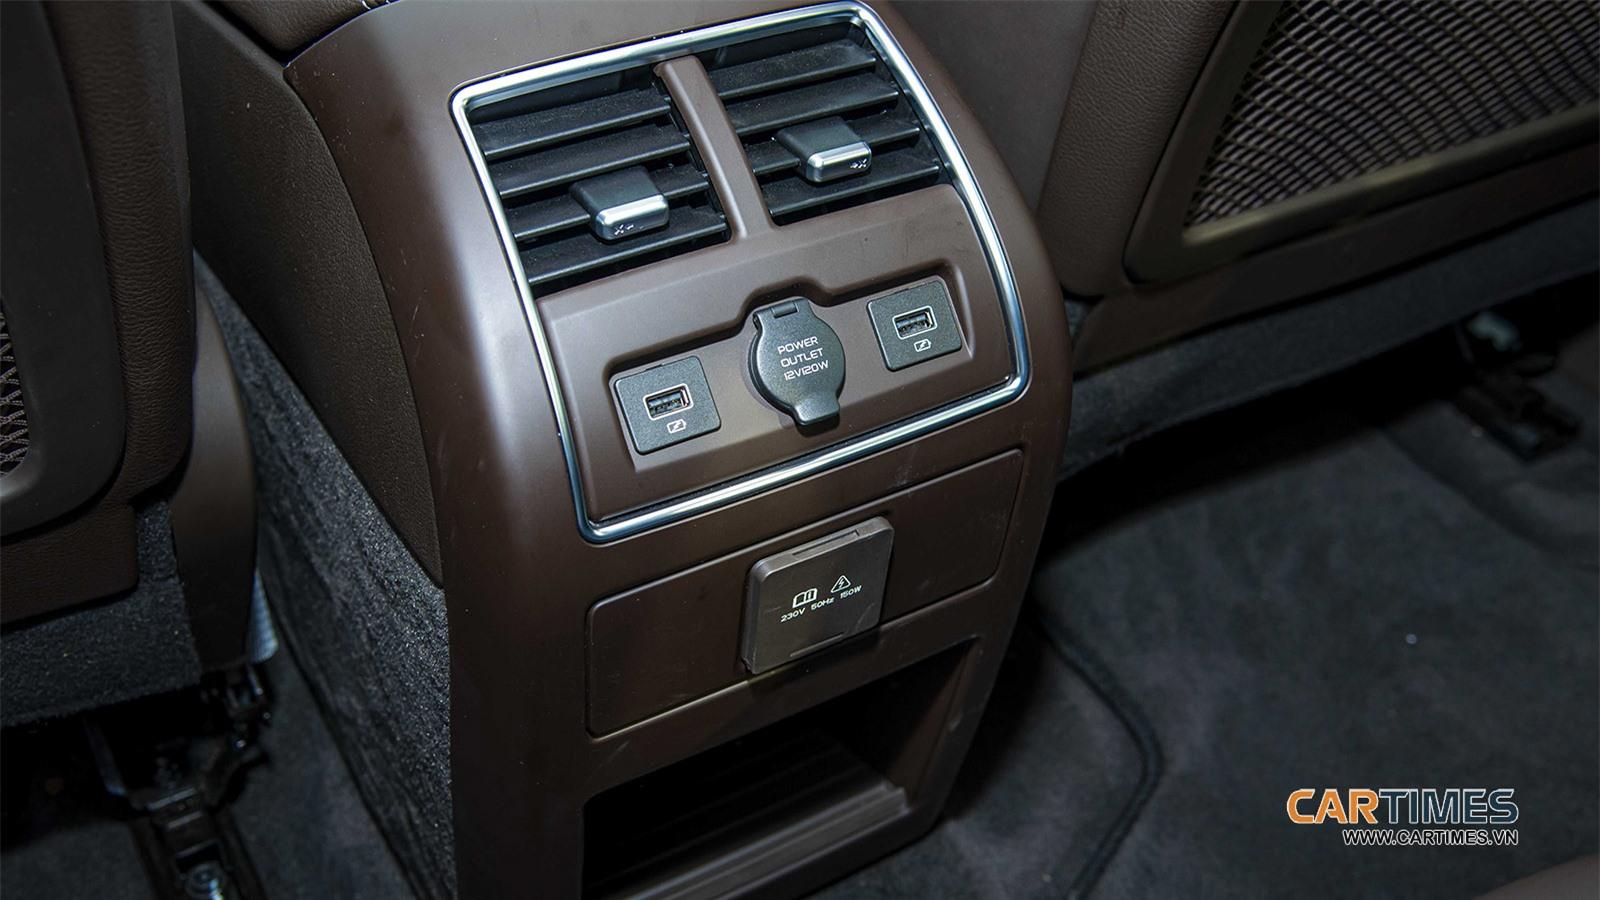 Nội thất xe VinFast Lux SA2.0